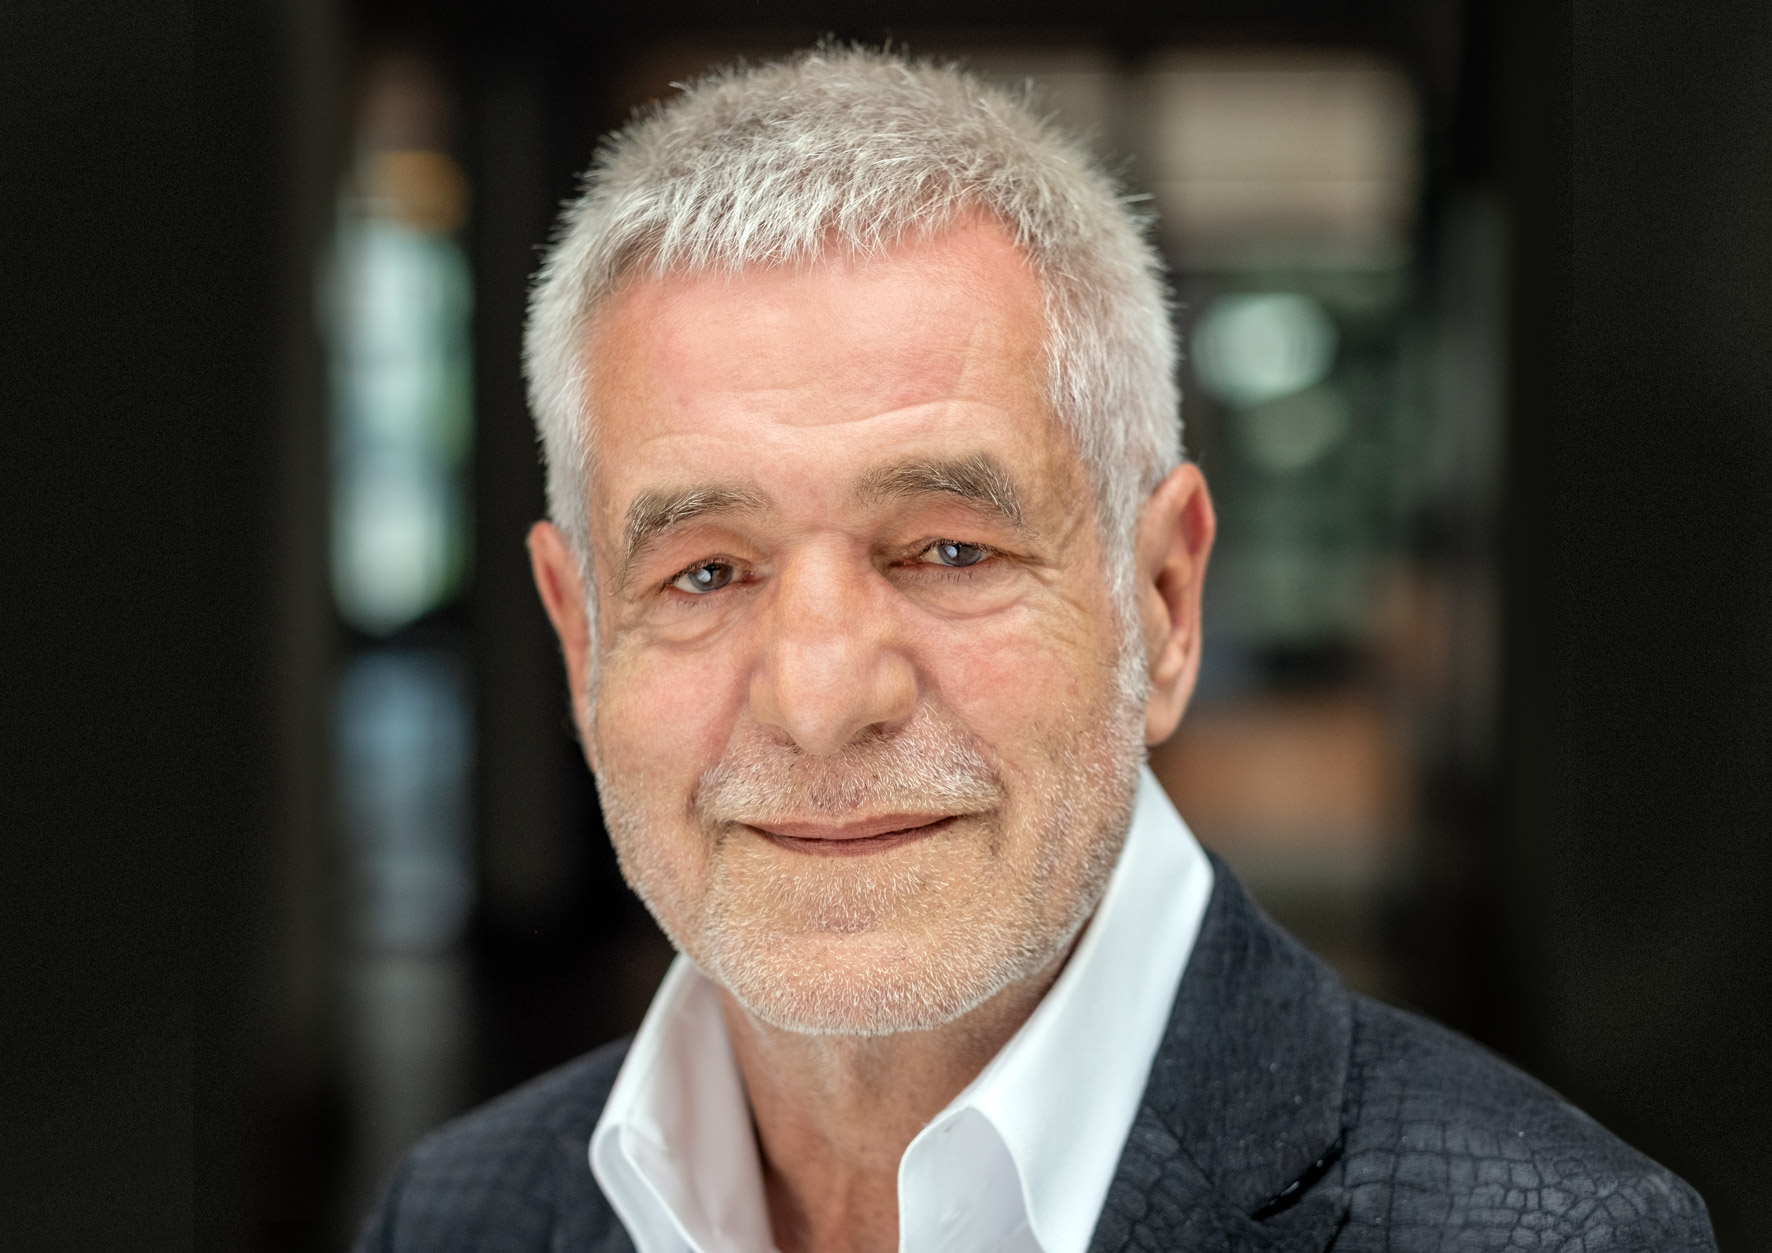 Prof. Ralf Niebergall